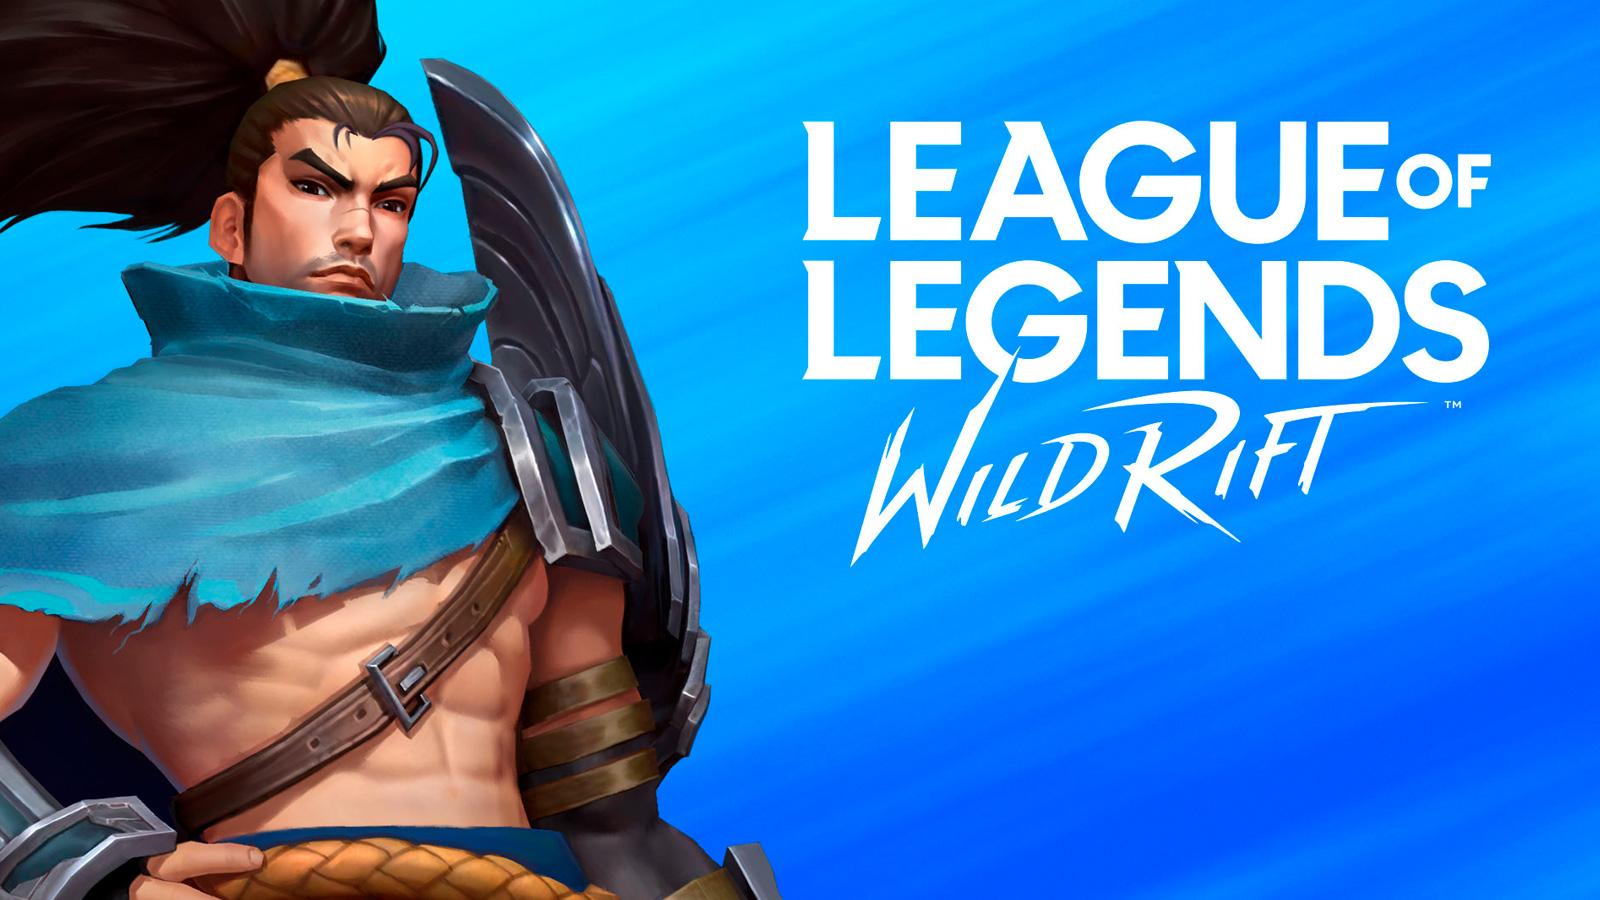 Yasuo con el logo de League of Legends: Wild Rift